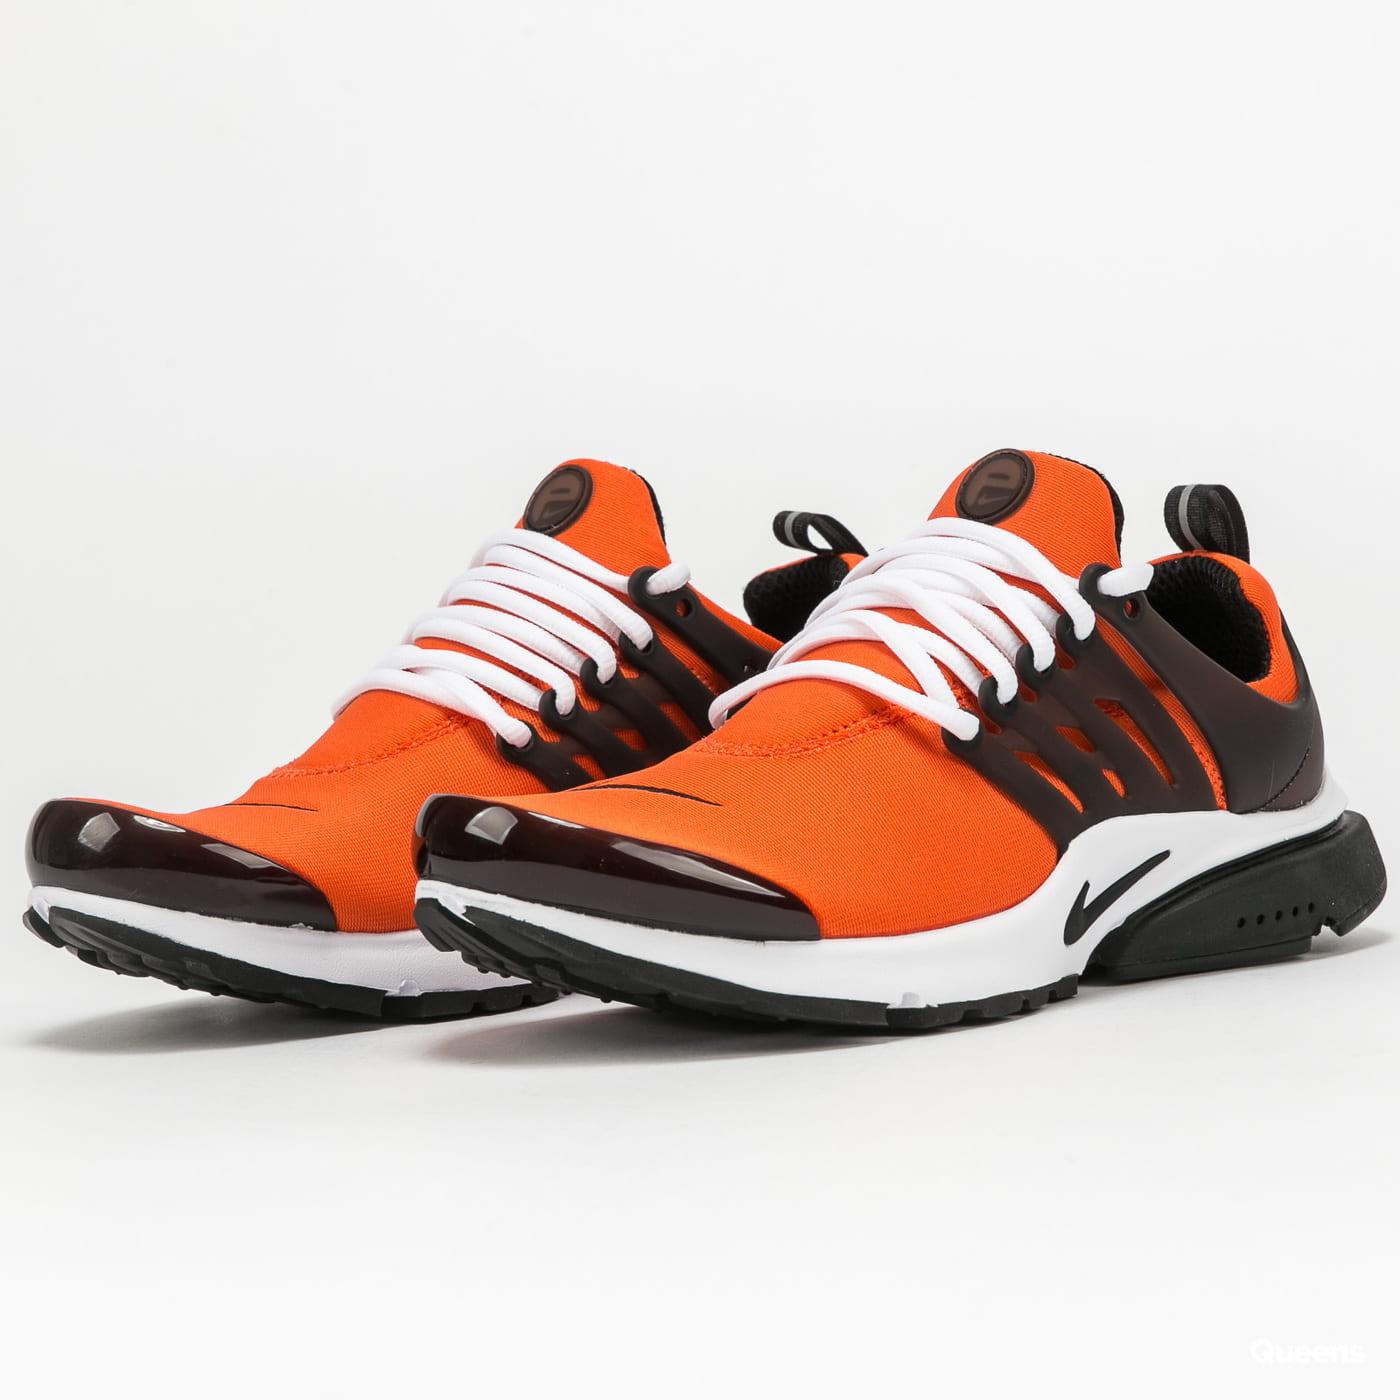 Nike Air Presto orange / black - white